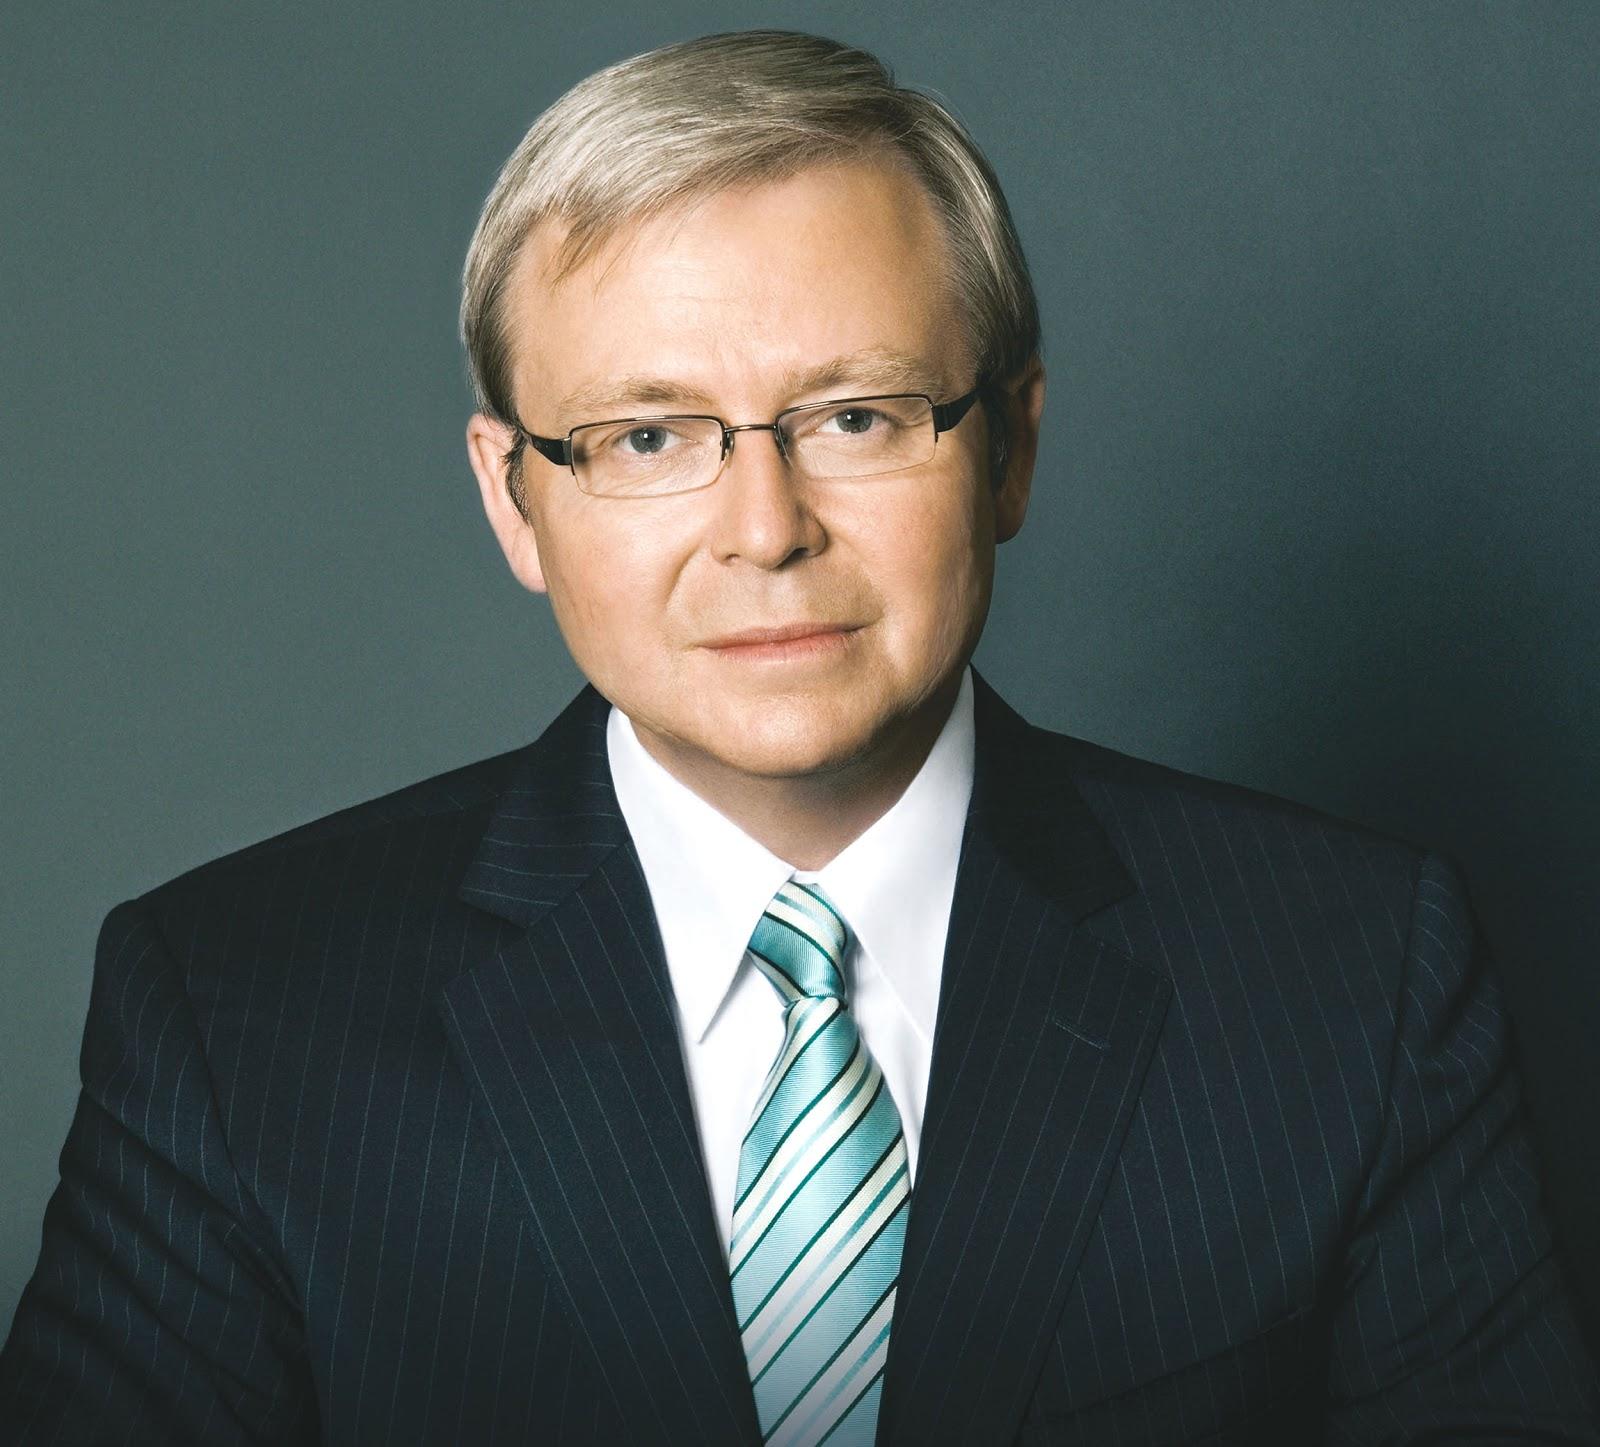 - Kevin Rudd